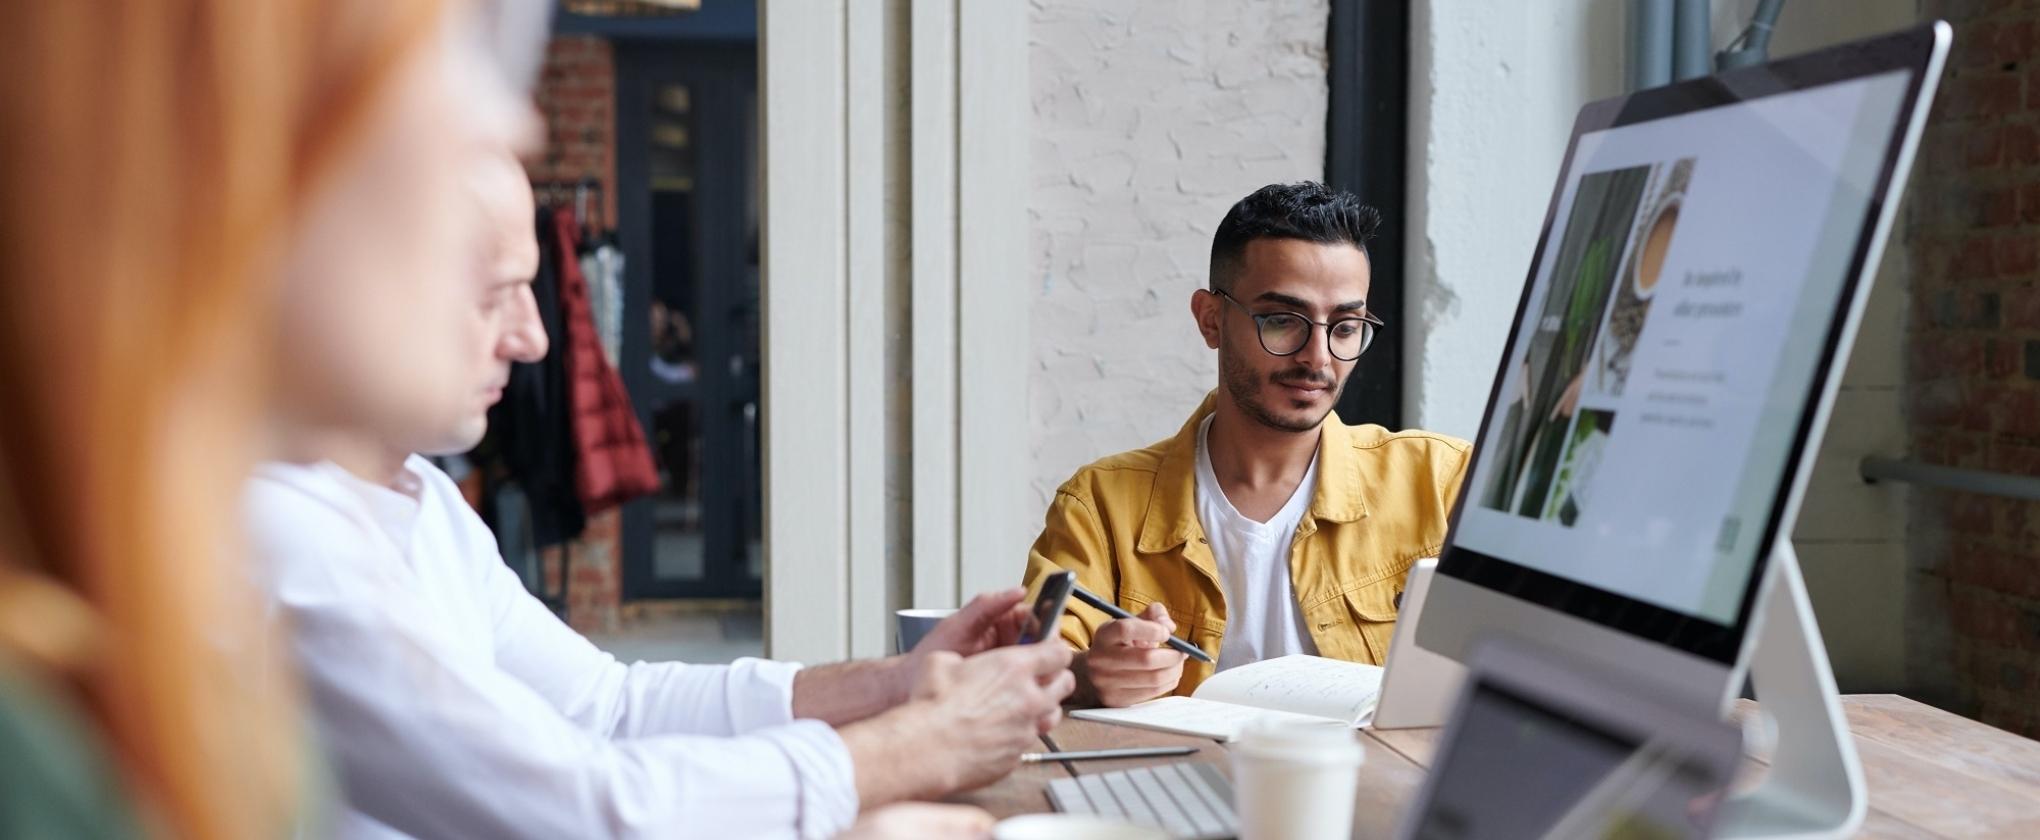 4 Omnichannel Marketing Strategies for SMEs